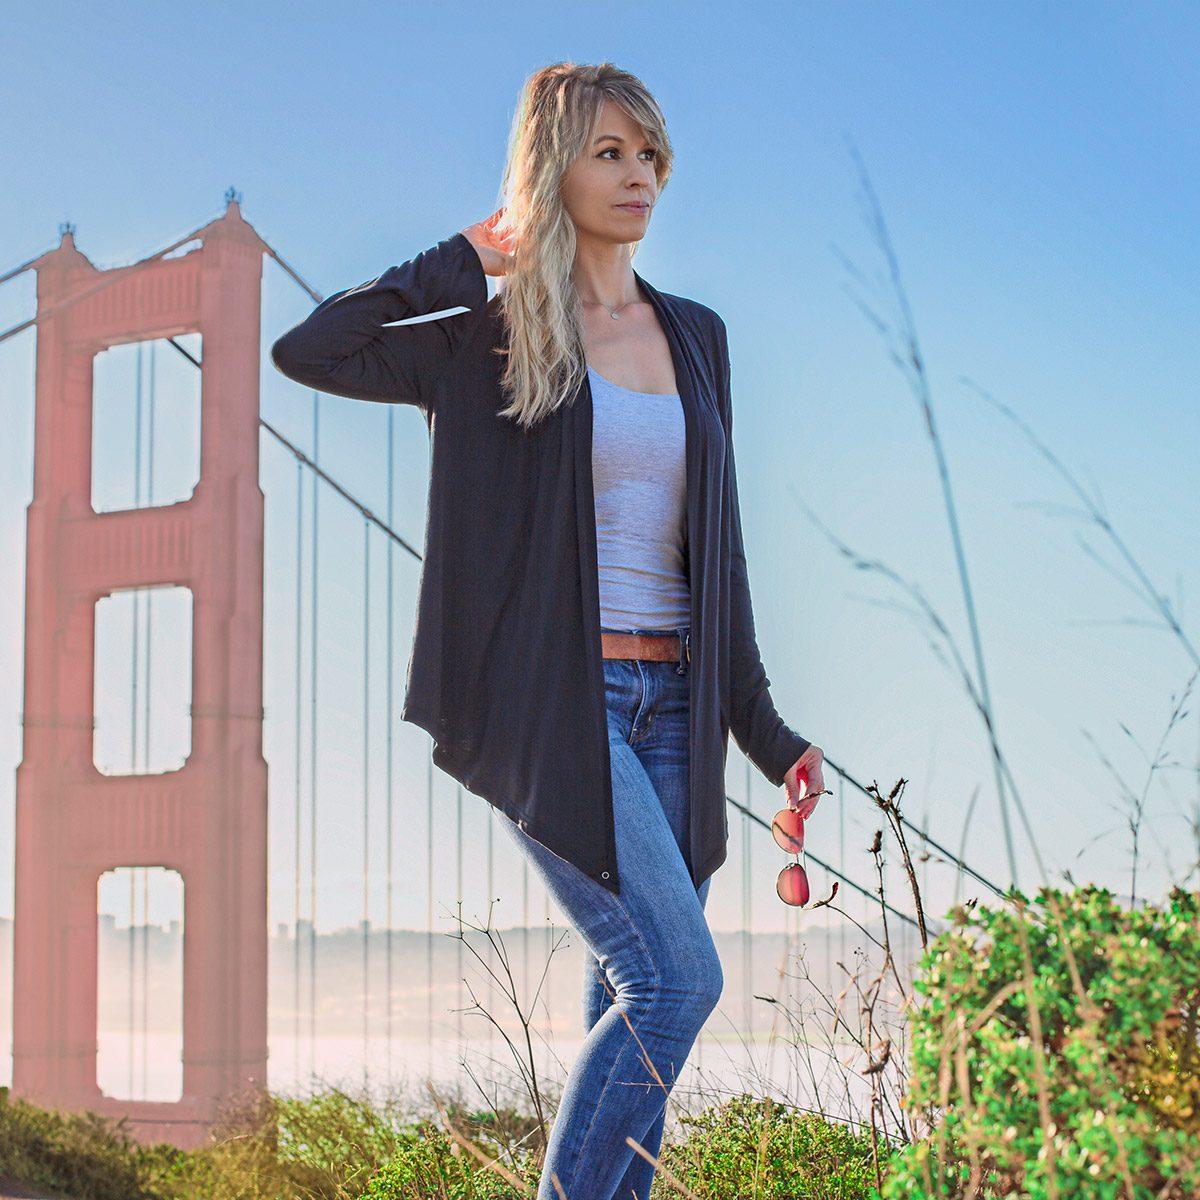 Elesk Apparel Women's Fashion Evolution Cardigan Product Image